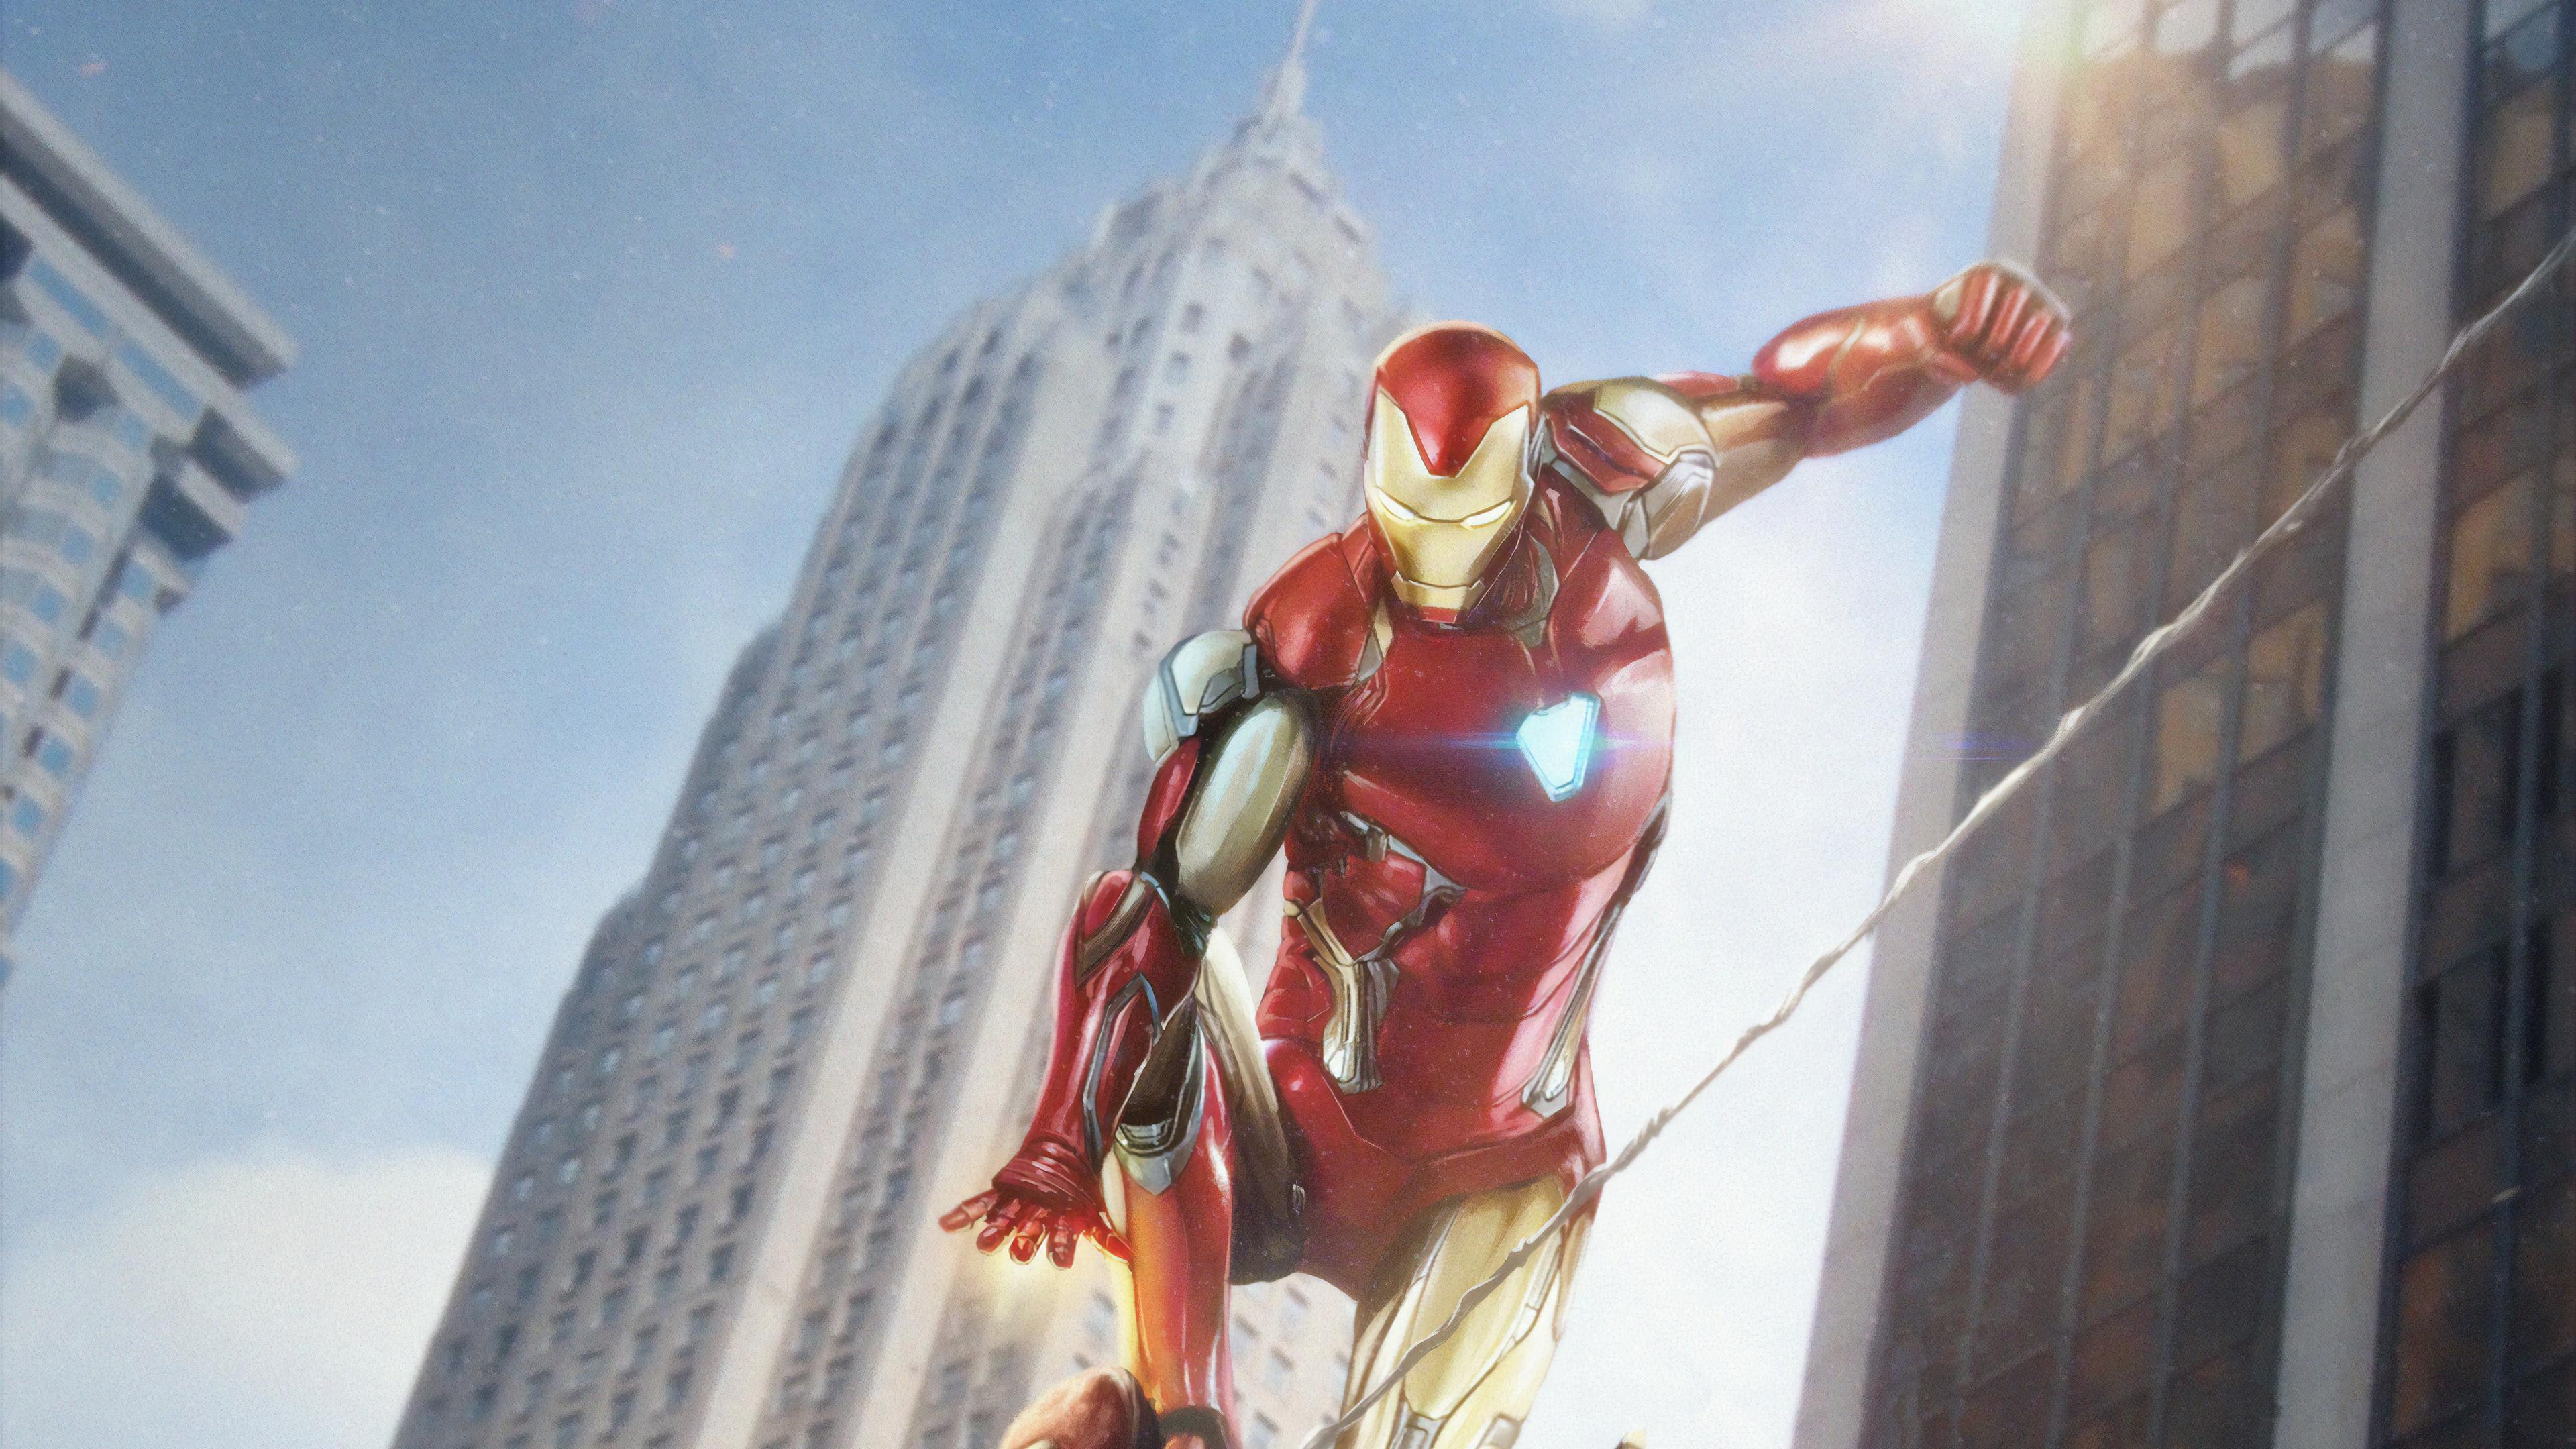 iron man vs spiderman 1565053829 - Iron Man Vs Spiderman - superheroes wallpapers, spiderman wallpapers, iron man wallpapers, hd-wallpapers, digital art wallpapers, artwork wallpapers, 4k-wallpapers